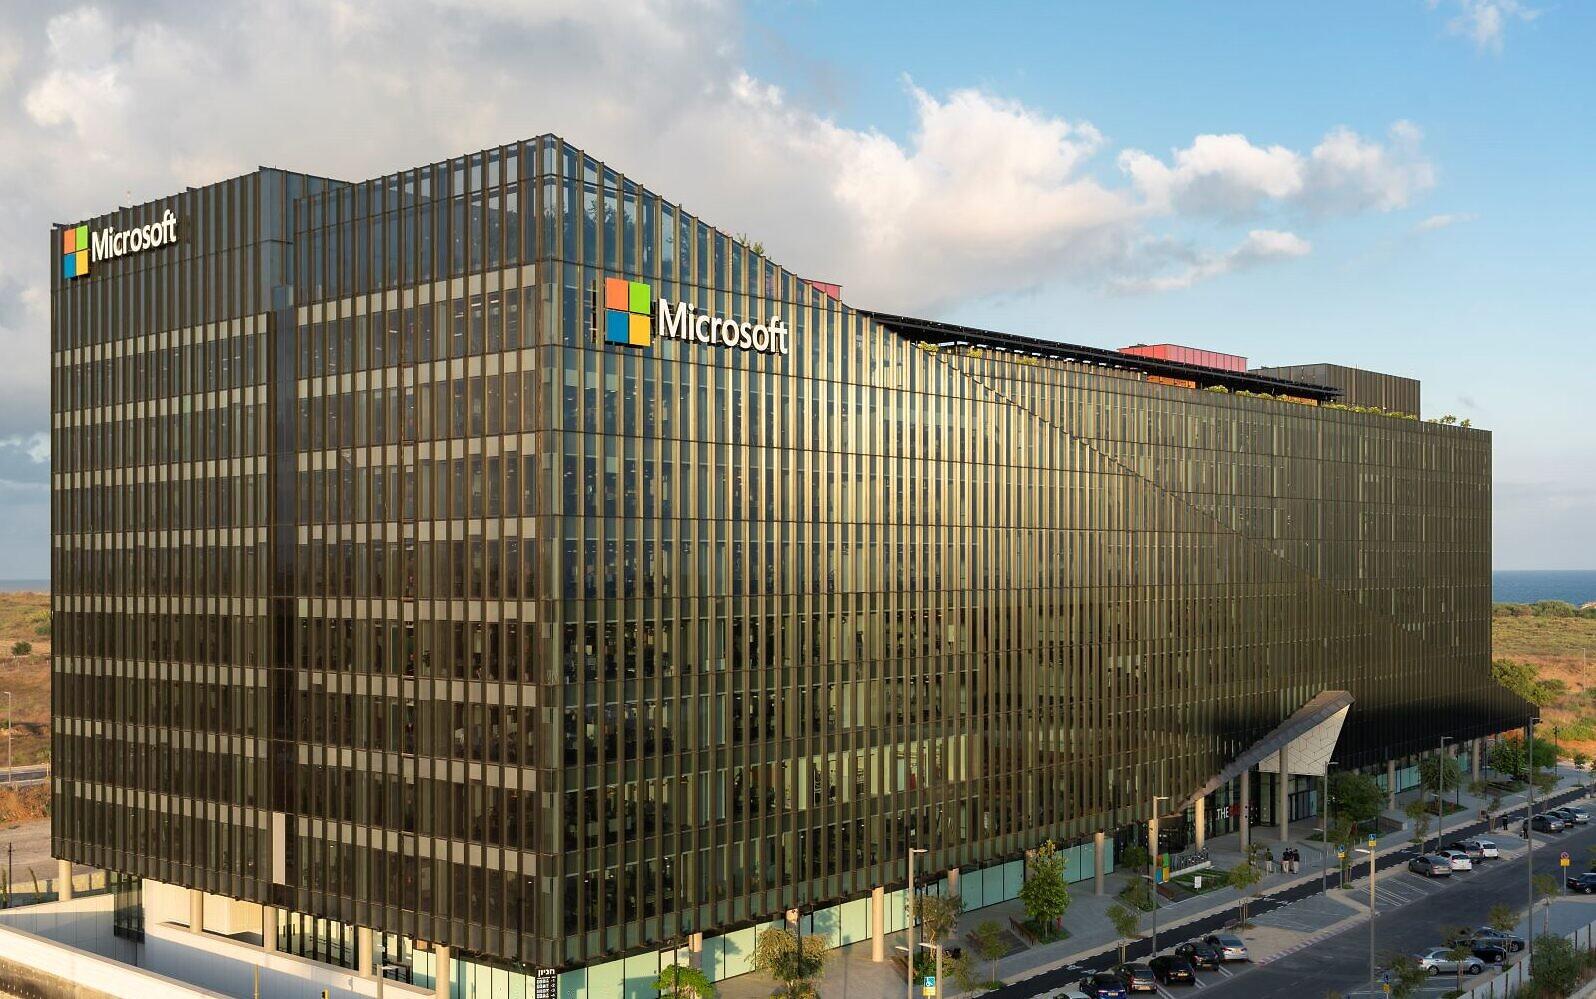 H Microsoft ετοιμάζει επένδυση ύψους 1 δισ. δολαρίων στο Ισραήλ